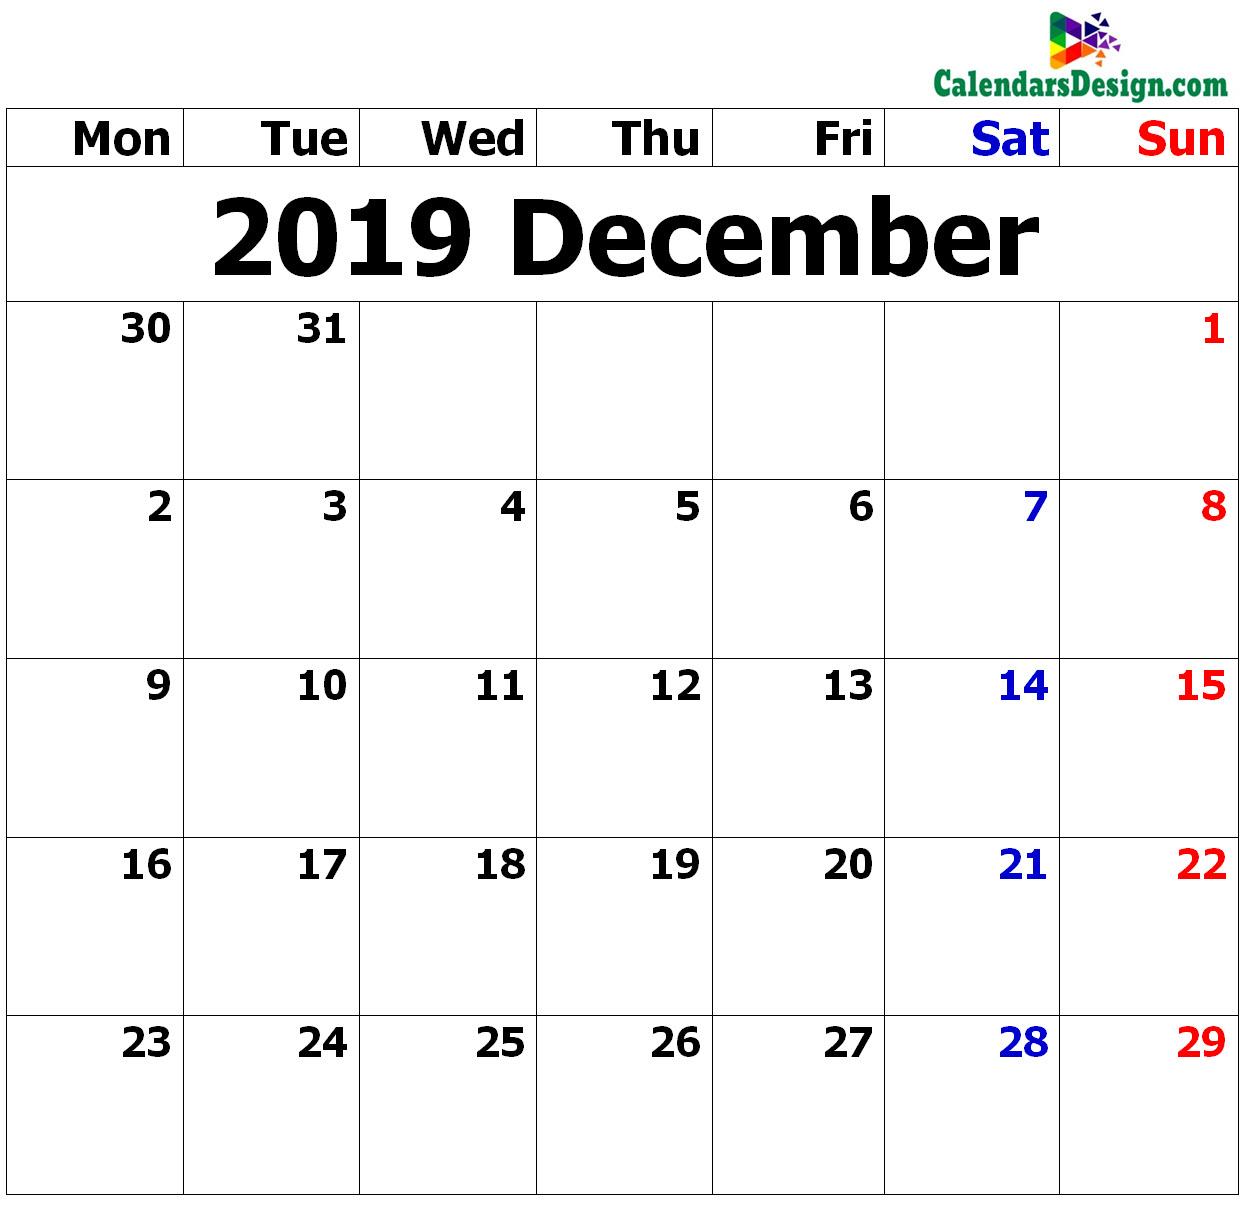 December Calendar 2019 in Excel Format